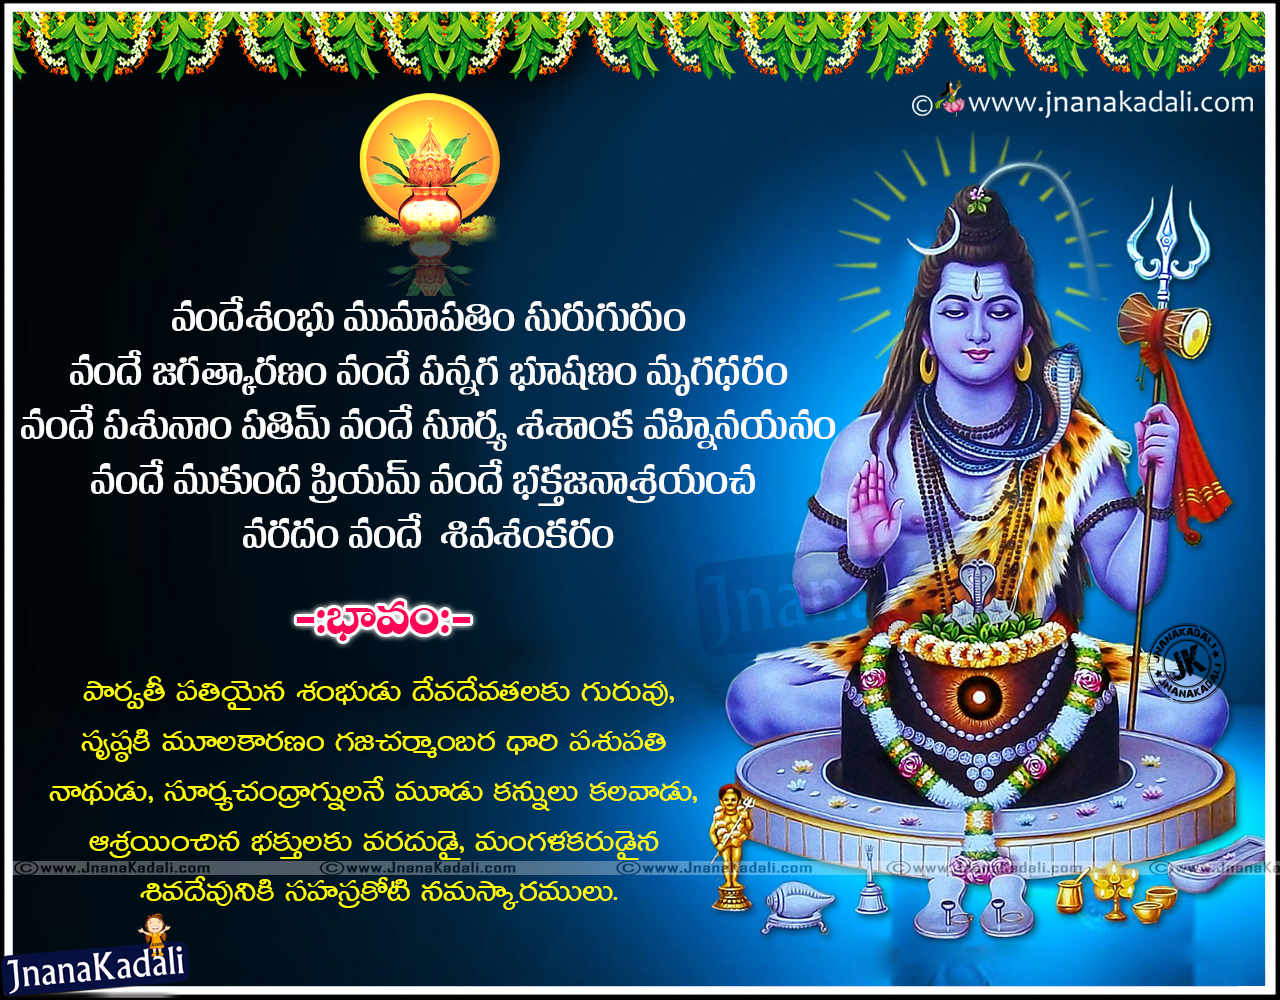 Lord Shiva Songs Om Vande Shambum Umapathim Sloka With Meaning Lord Shiva Hd Png Wallpapers Jnana Kadali Com Telugu Quotes English Quotes Hindi Quotes Tamil Quotes Dharmasandehalu